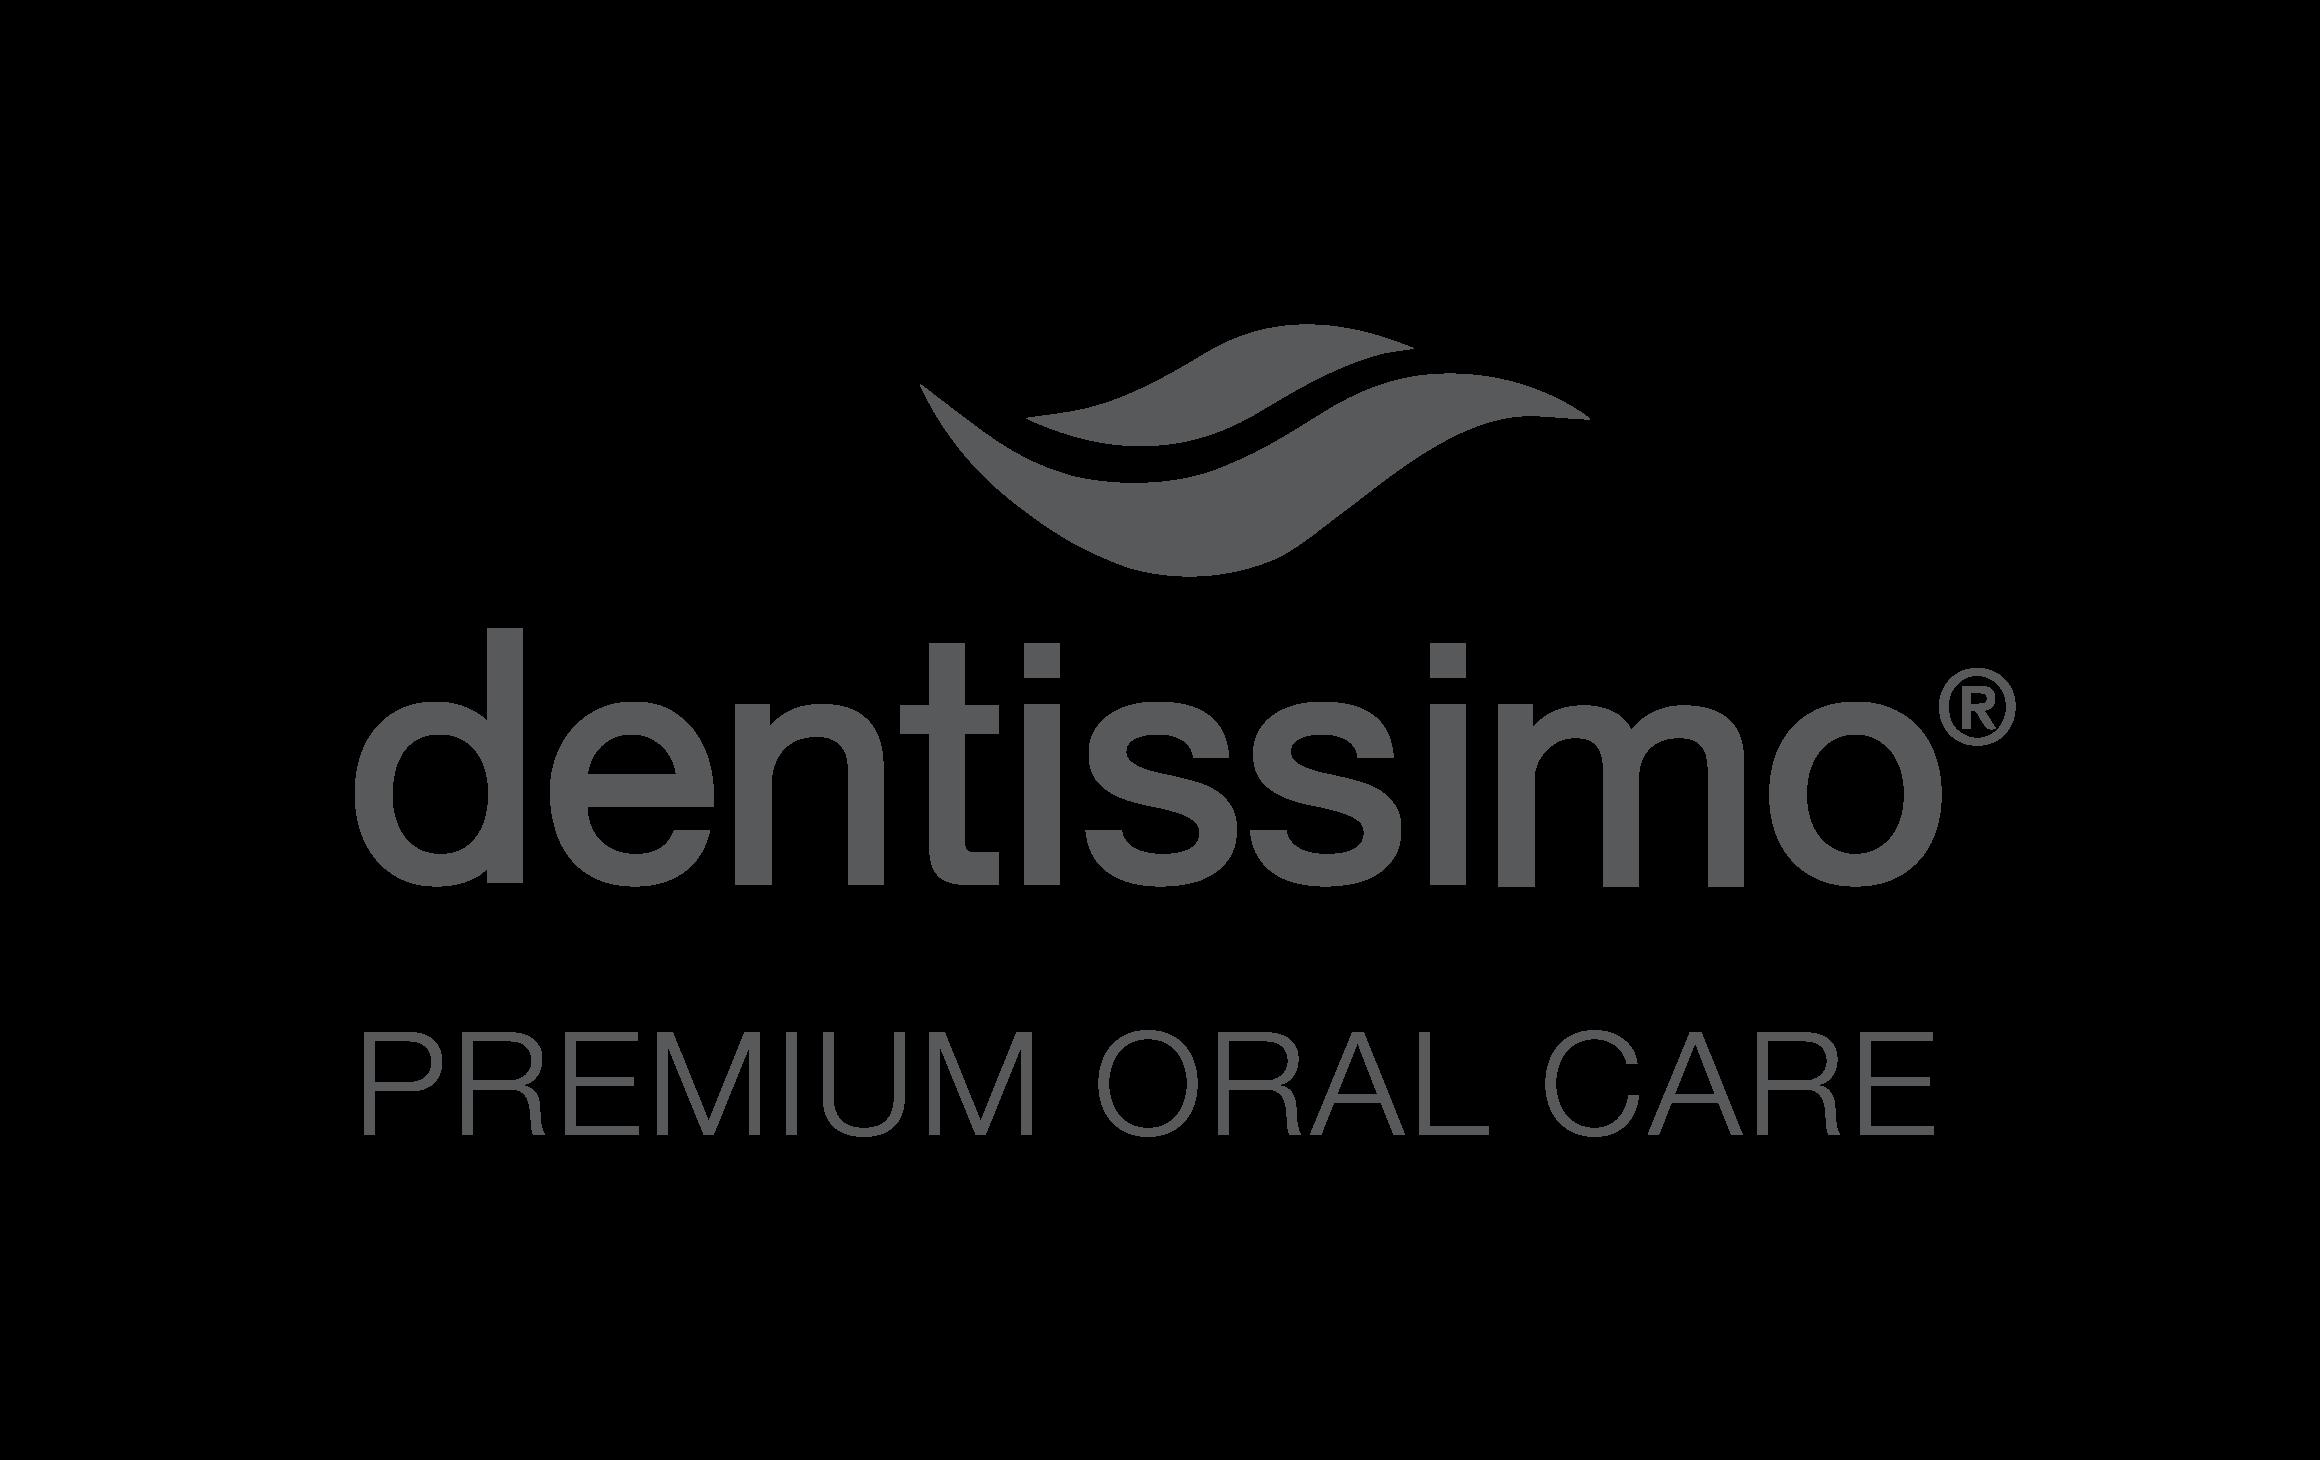 Dentissimo Premium Oral Care